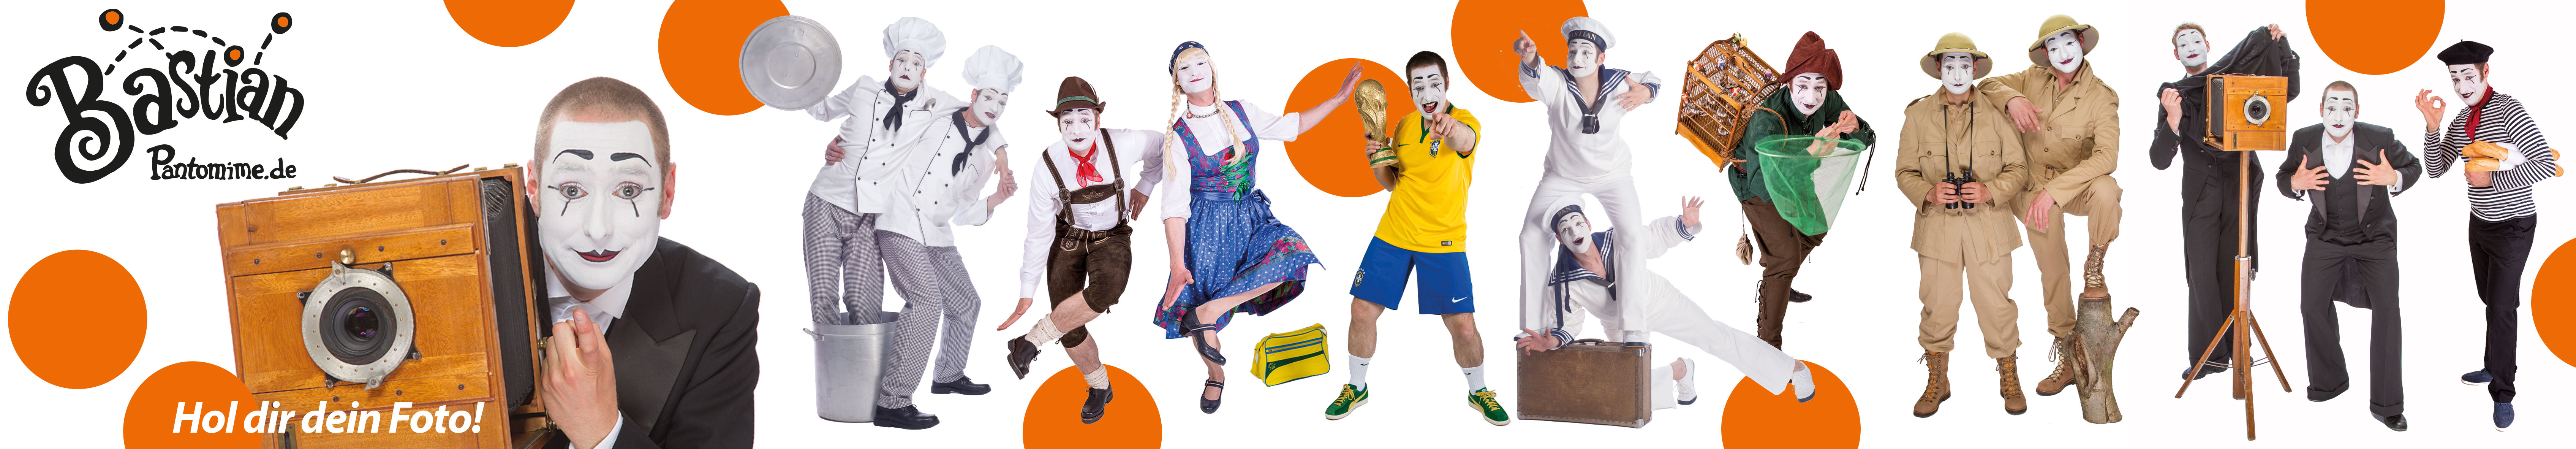 Pantomime Bastian´s Foto Walk-Act Bildergalerien